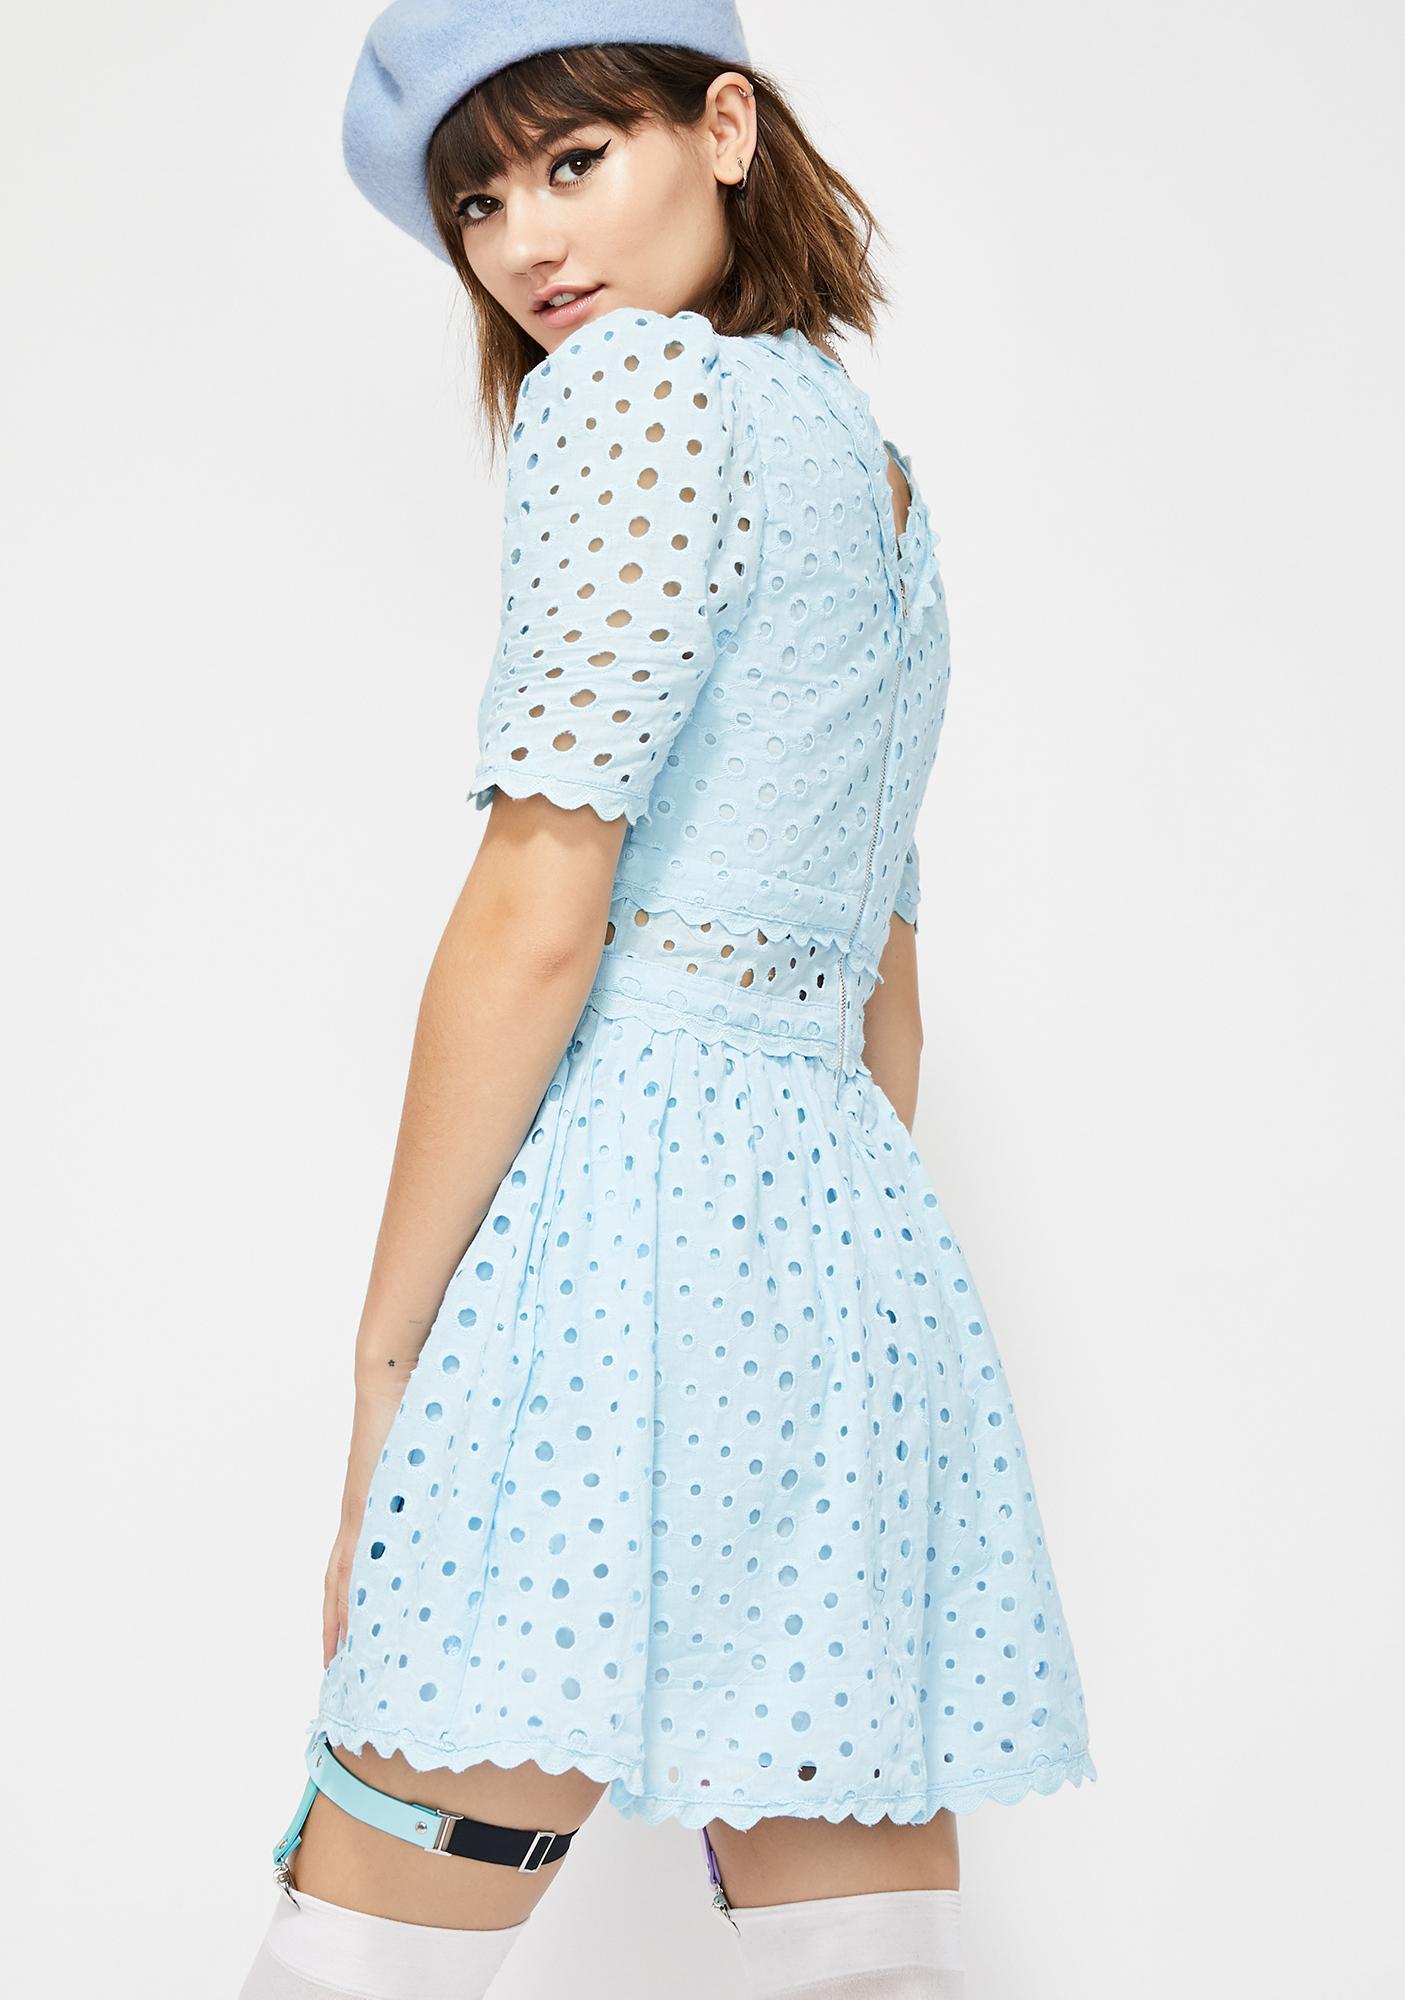 Bubble Pop Electric Mini Dress